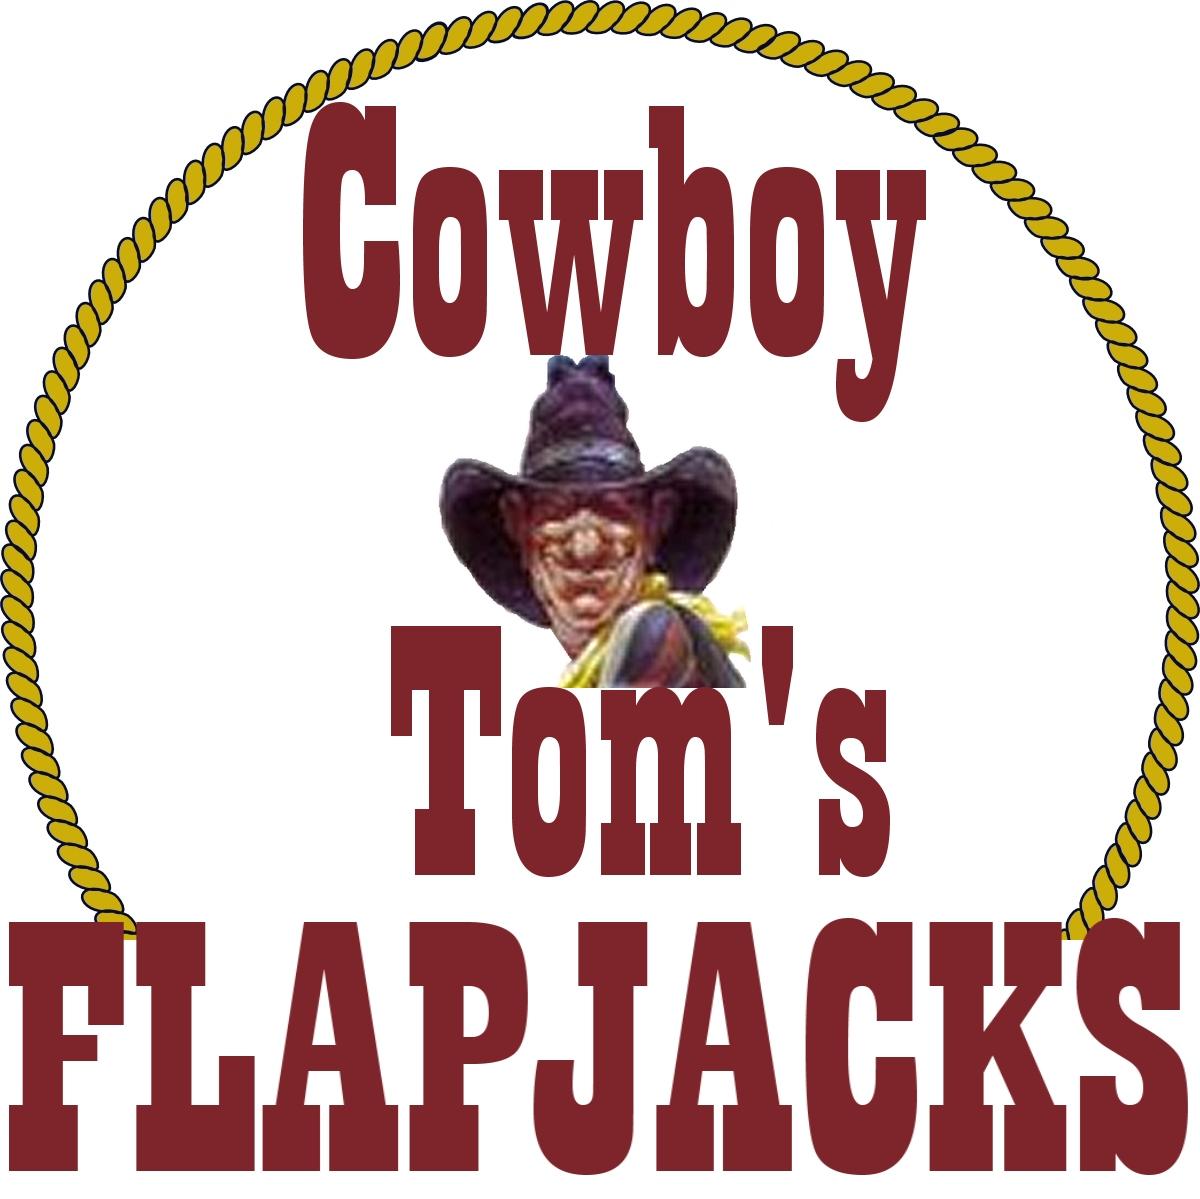 Cowboy Tom's Flapjacks